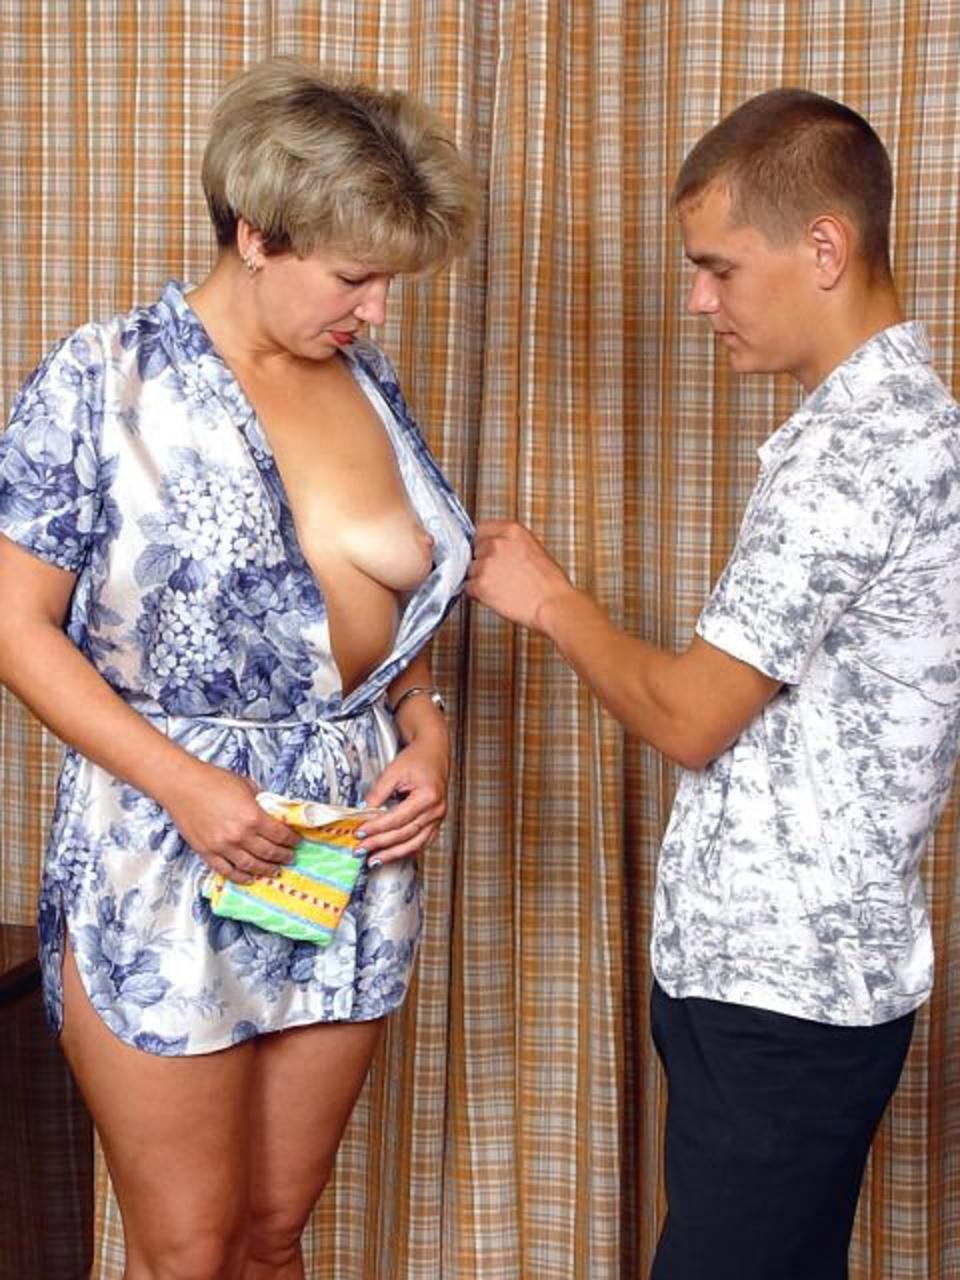 sinok-pristaet-k-mame-porno